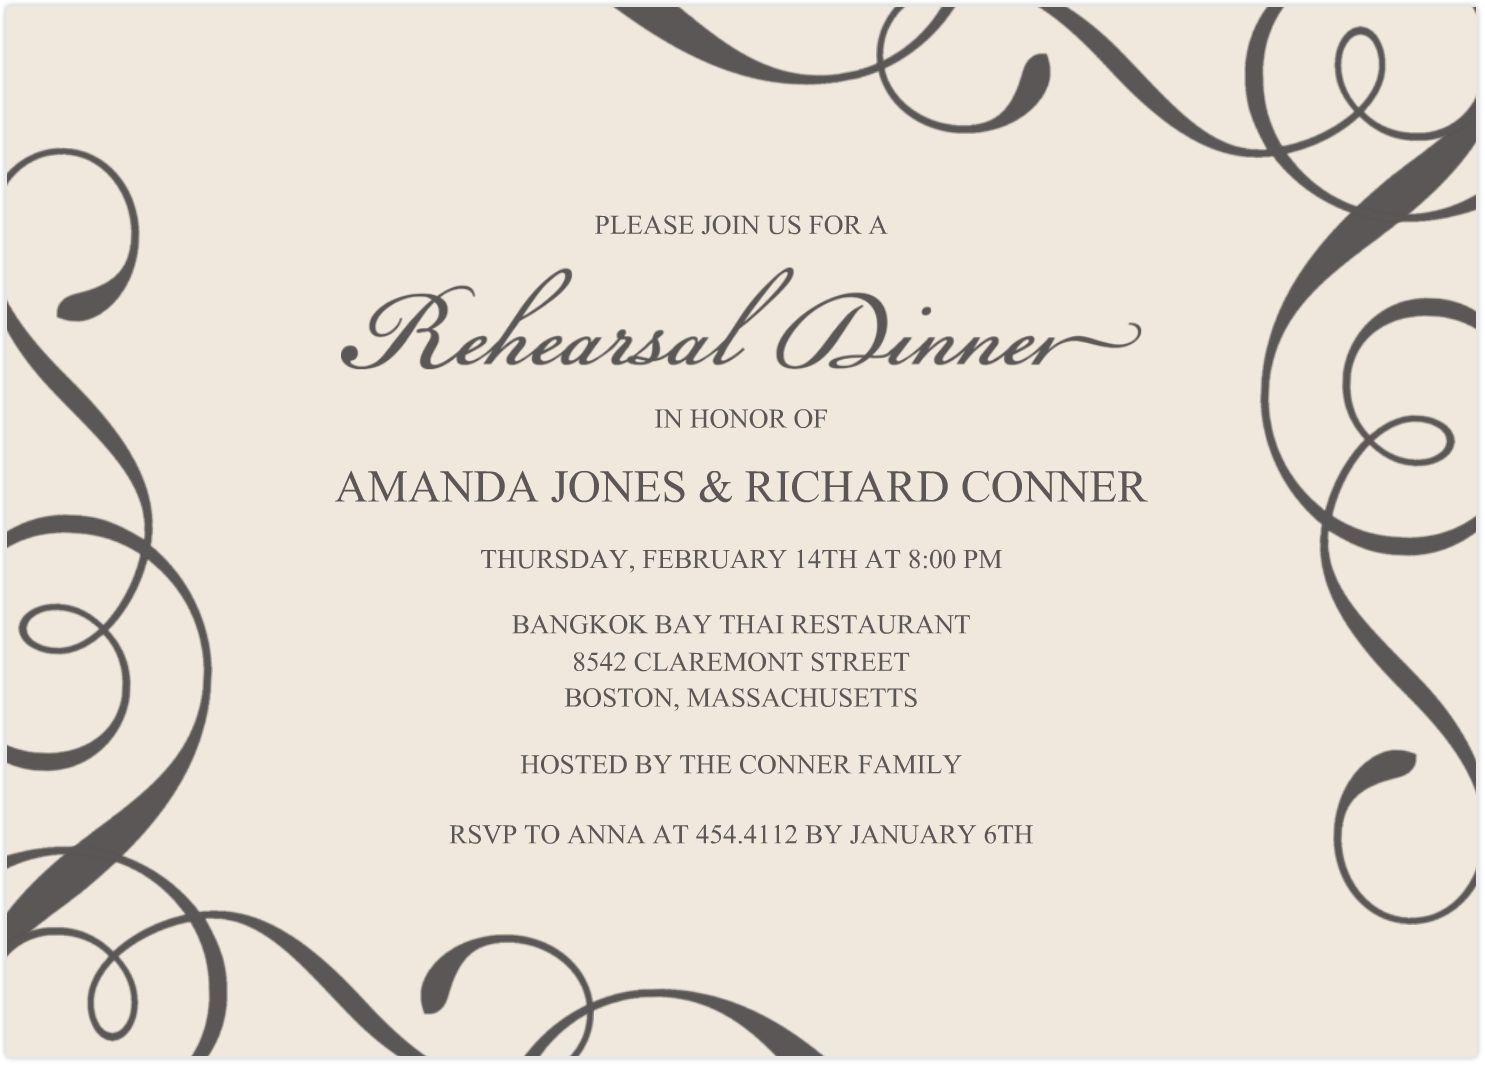 011 Fascinating Wedding Invitation Template Word High Def  Invite Wording Uk Anniversary Microsoft Free MarriageFull